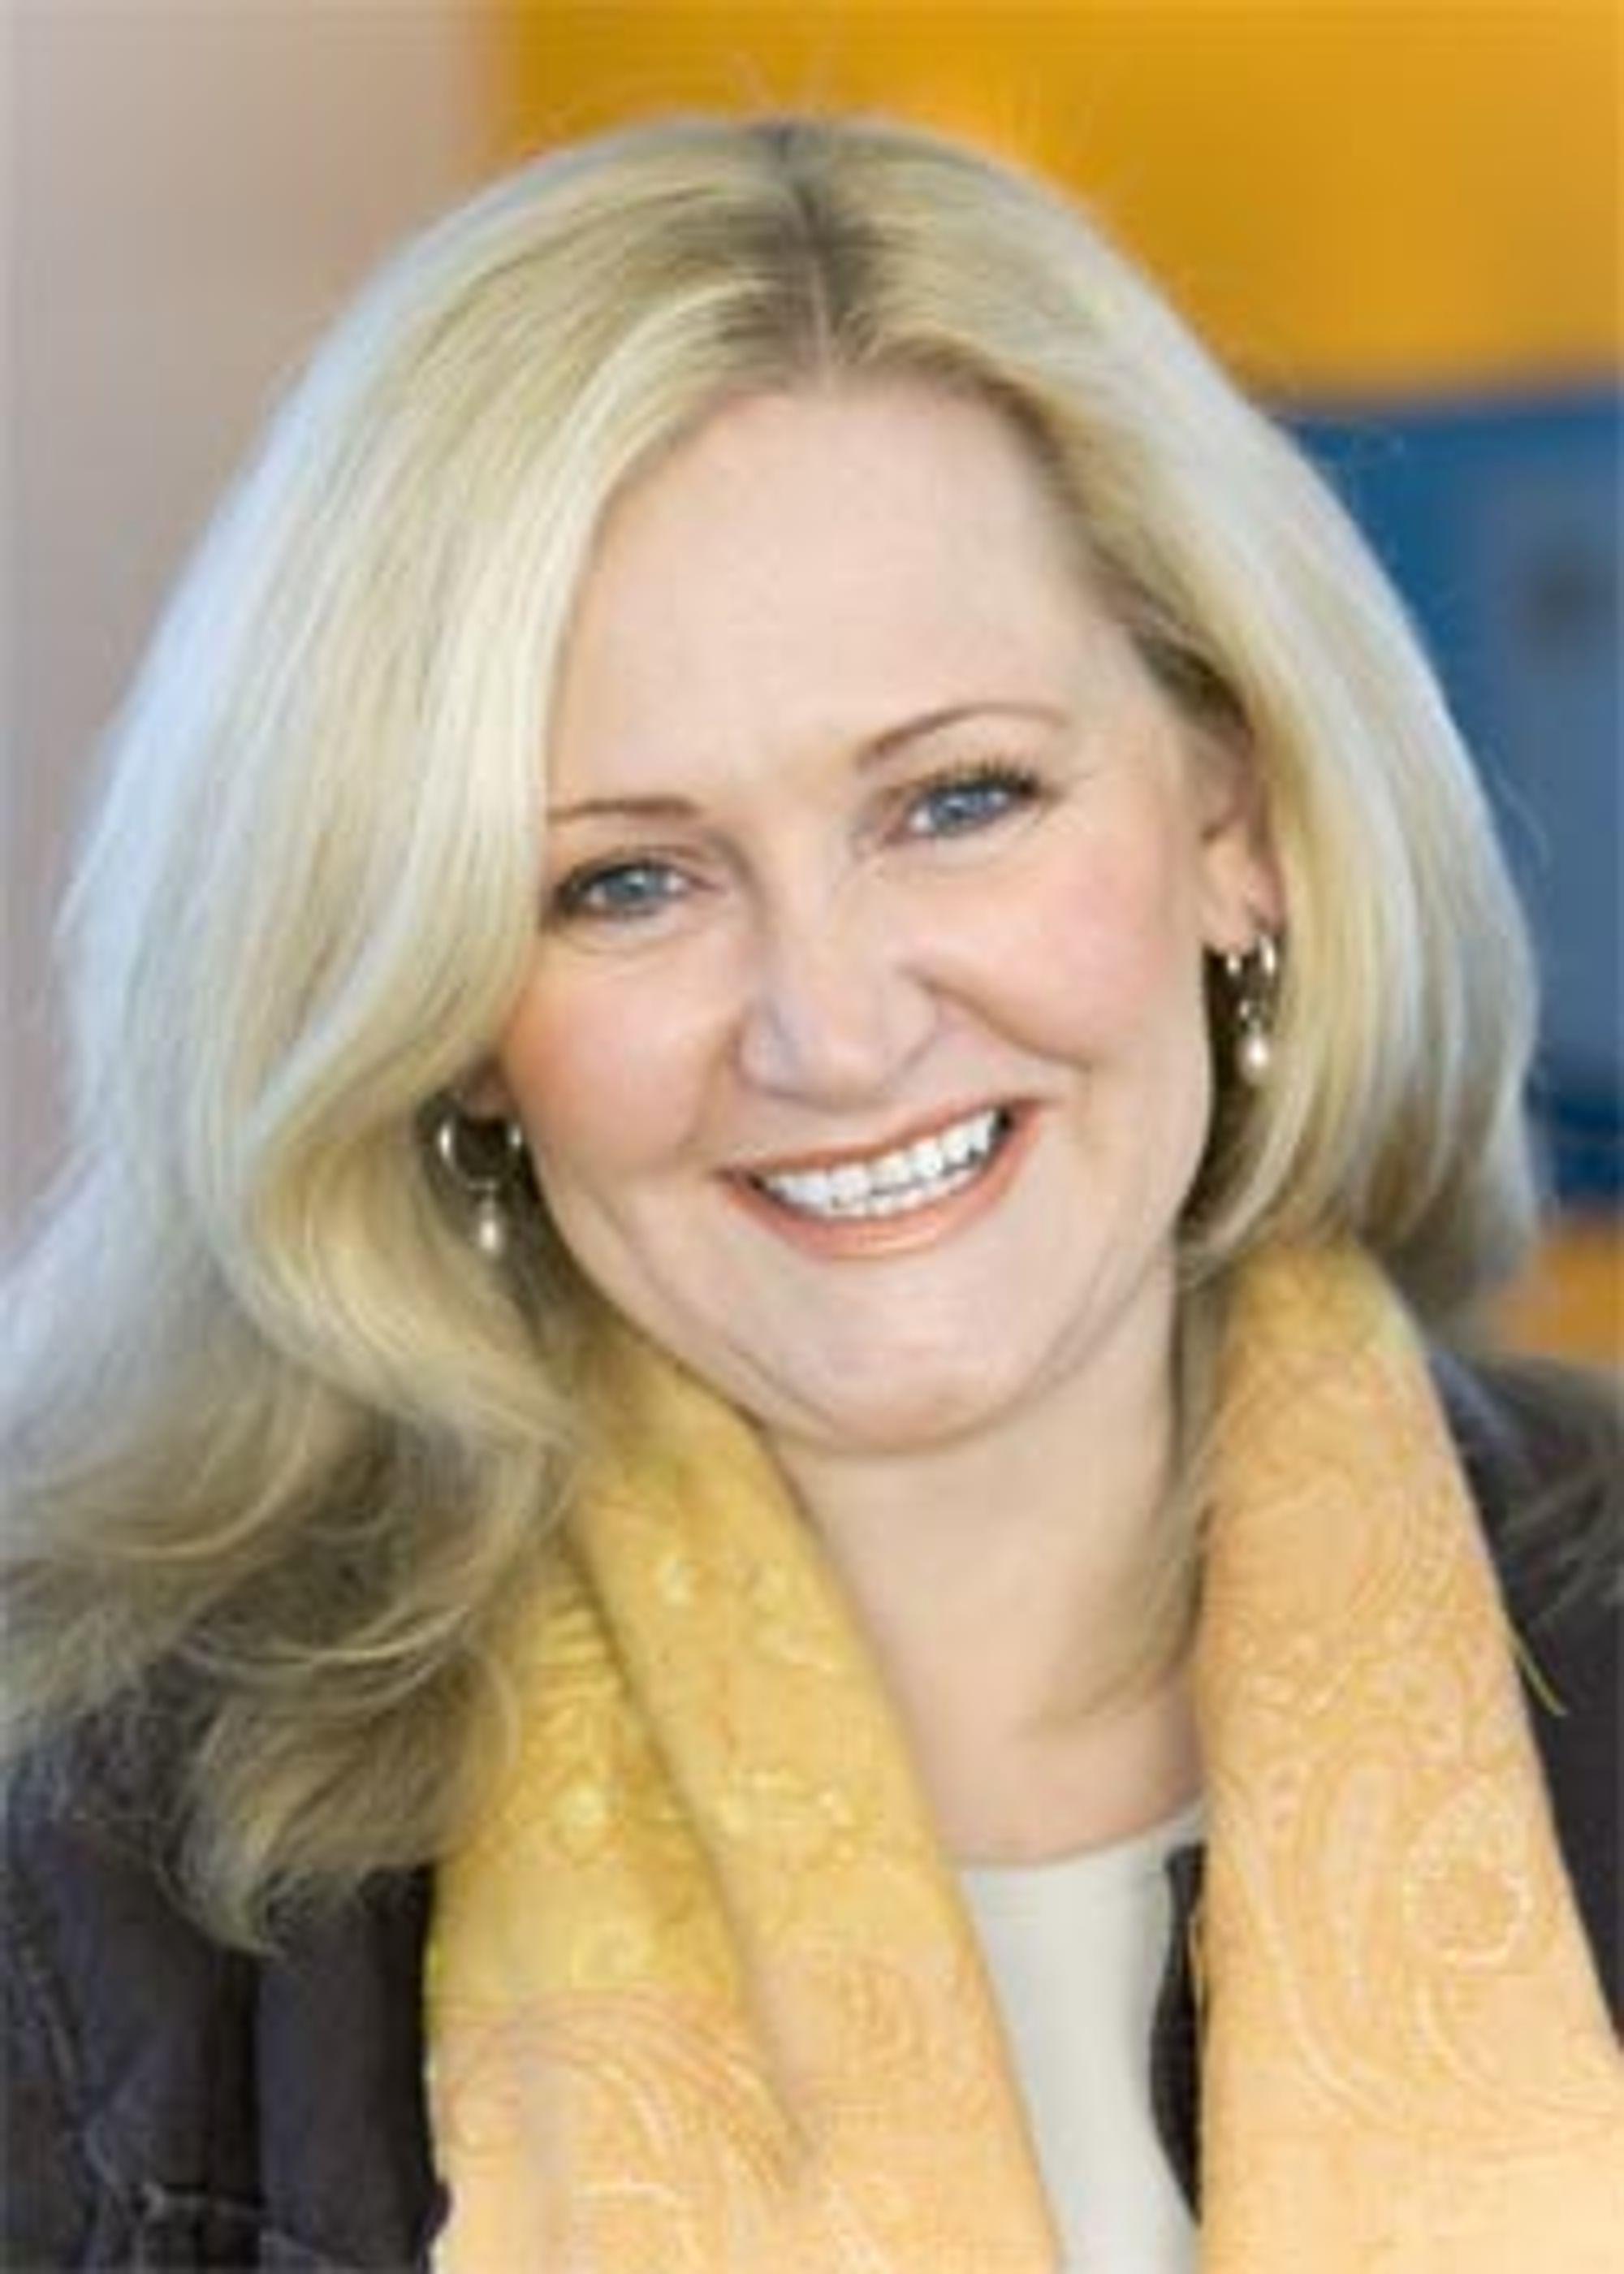 Kommunikasjonssjef i NetCom, Guri Wormdahl